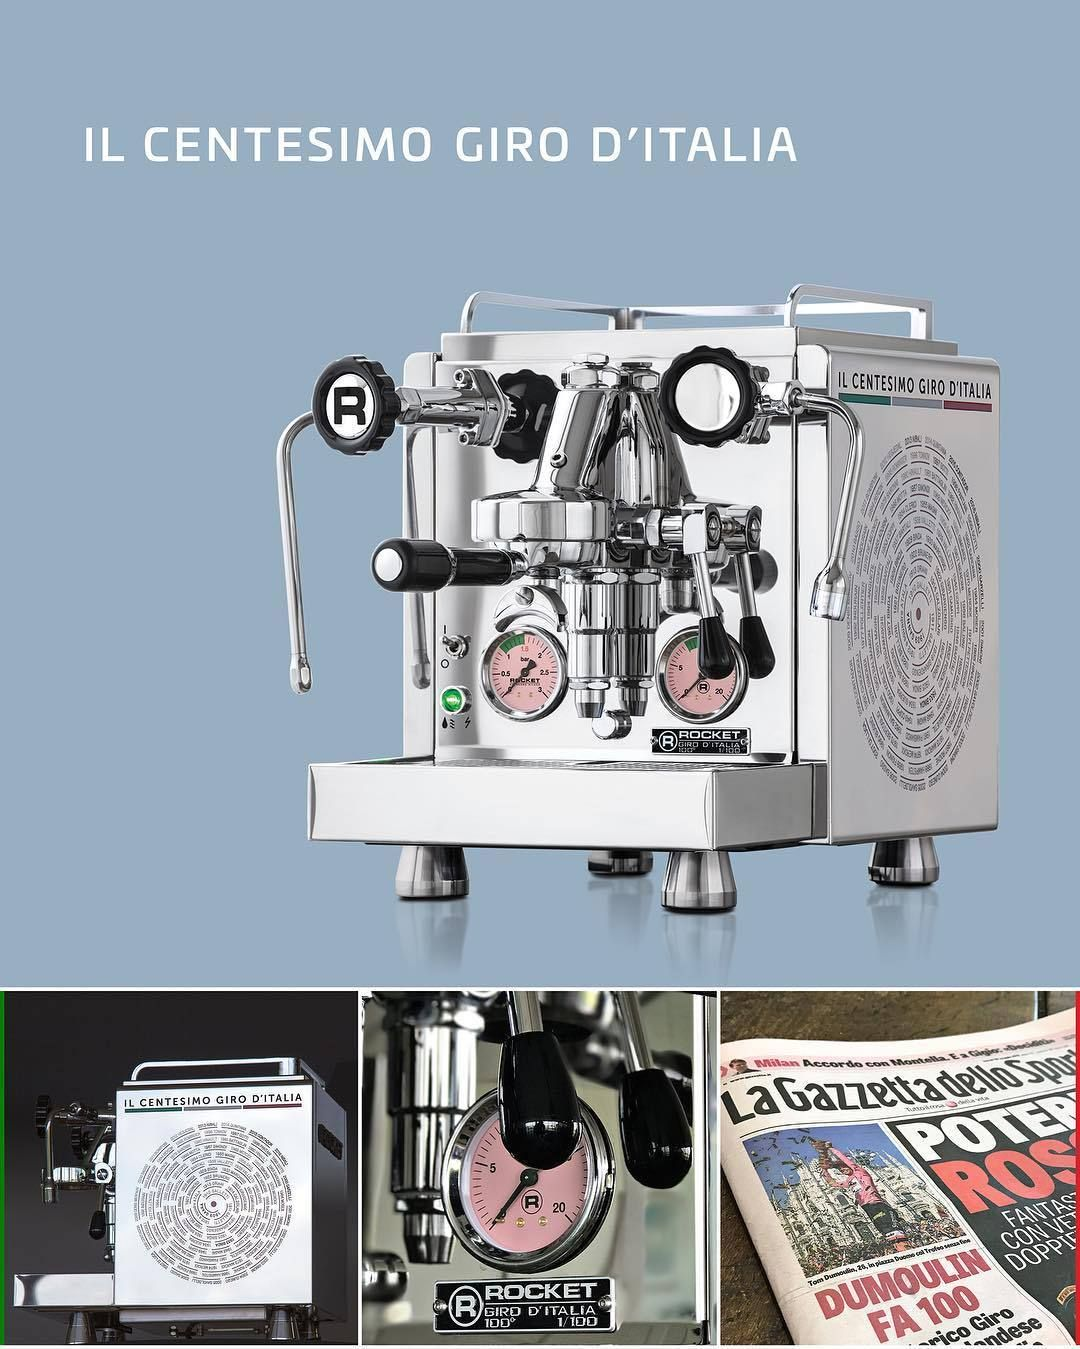 Rocket Espresso: U201cTo Celebrate The 100th Edition Of The Giro Du0027Italia Race, Rocket  Espresso Will Release U0027IL CENTESIMO GIRO Du0027ITALIAu0027 100 Individual ...